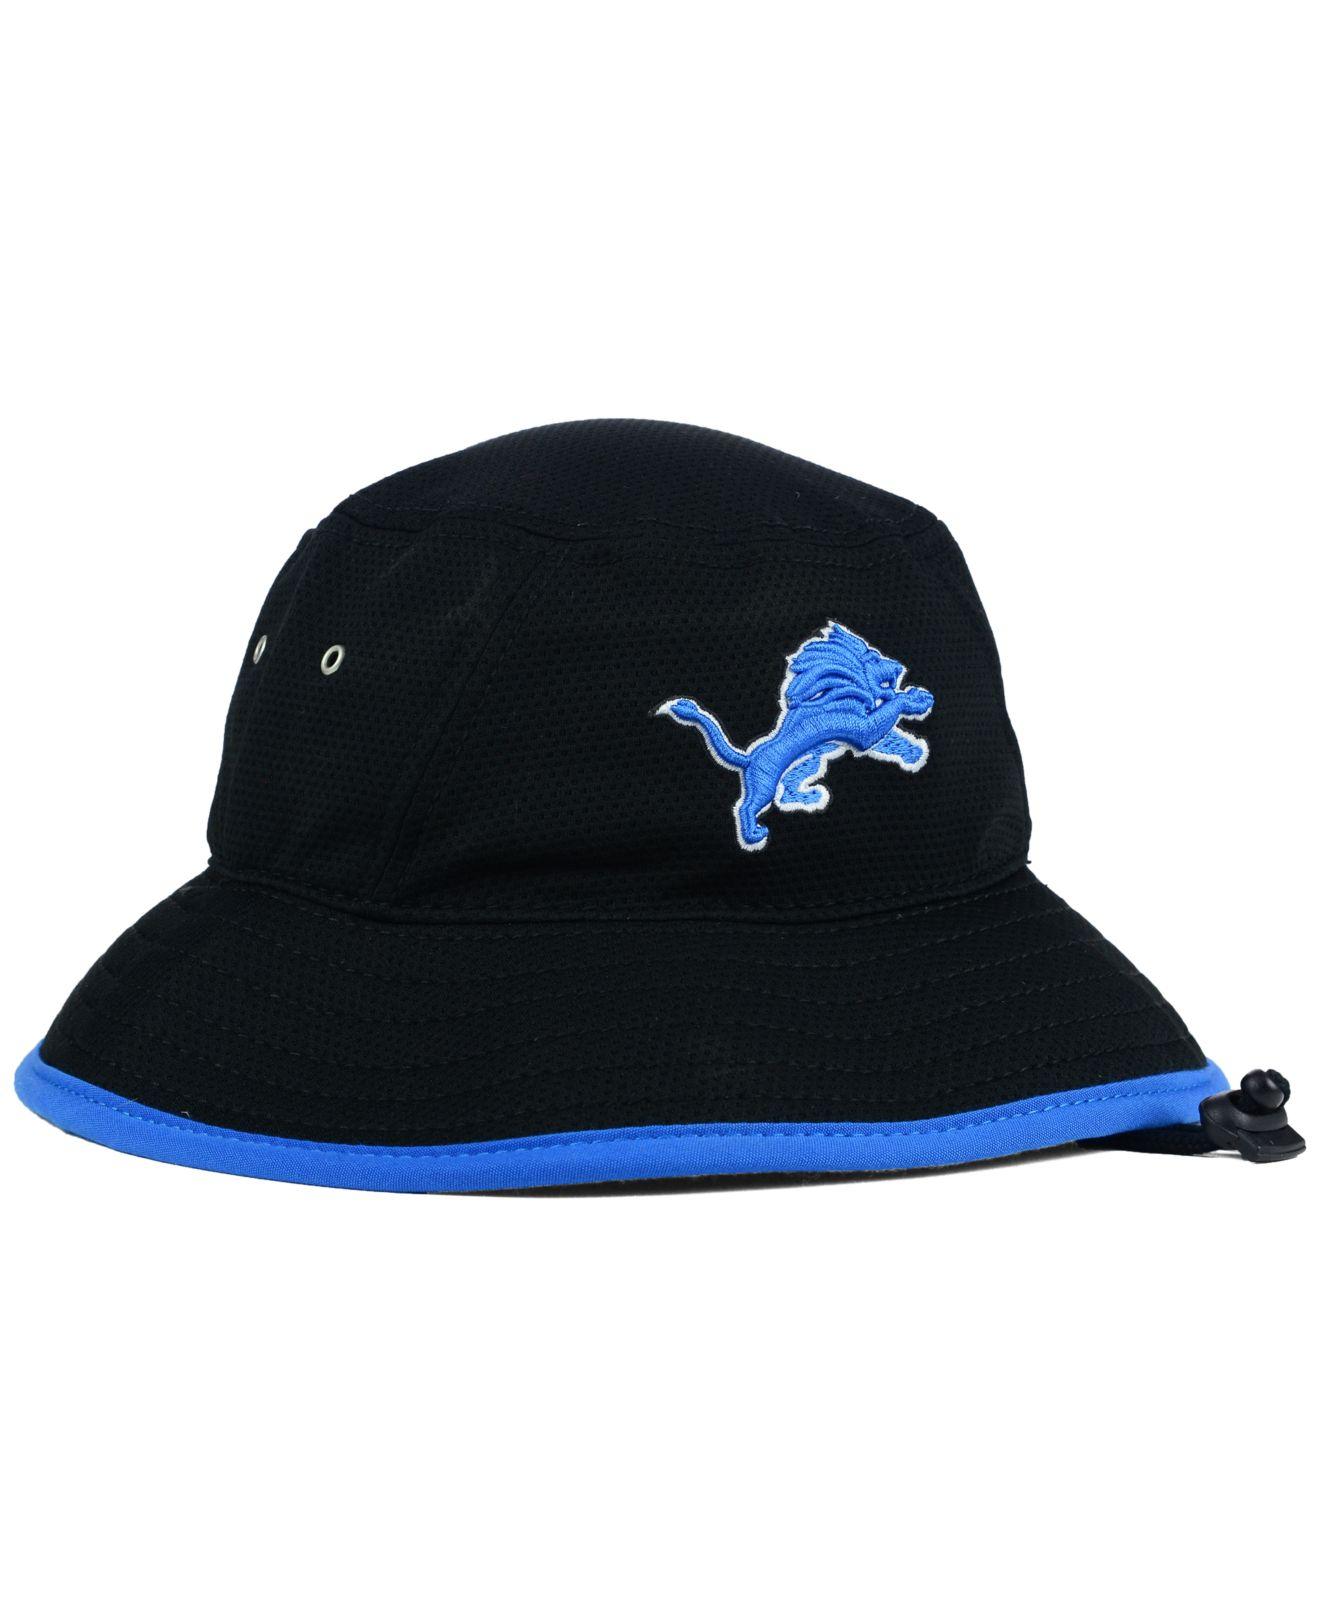 ktz detroit lions training bucket hat in black for men lyst